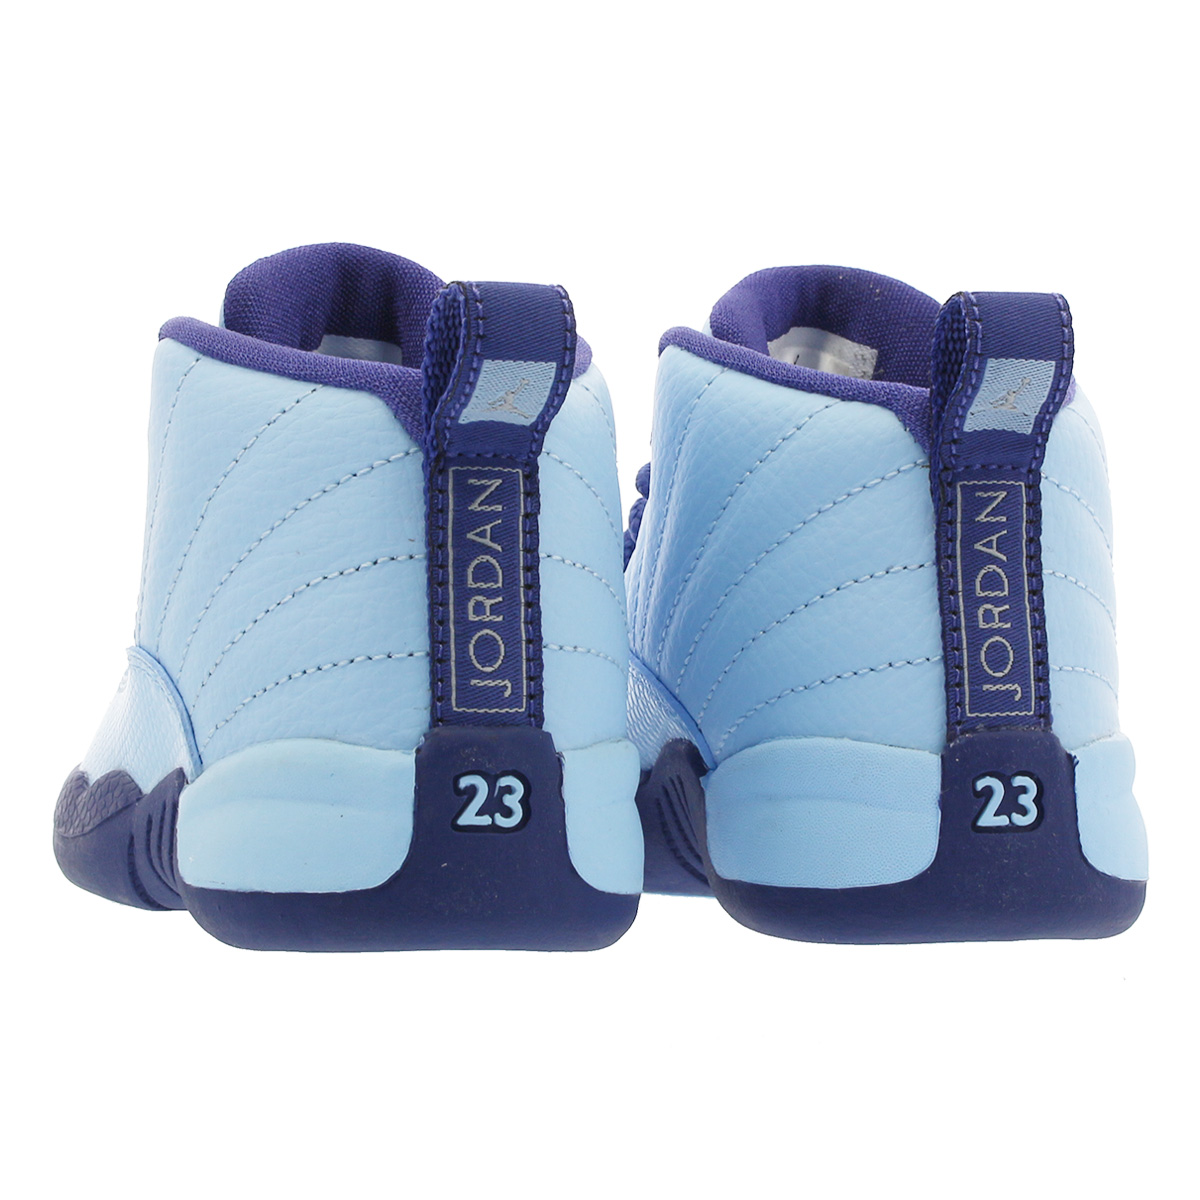 0092698b671e NIKE AIR JORDAN 12 RETRO TD Nike Air Jordan 12 nostalgic TD LIGHT BLUE NAVY  BLUE